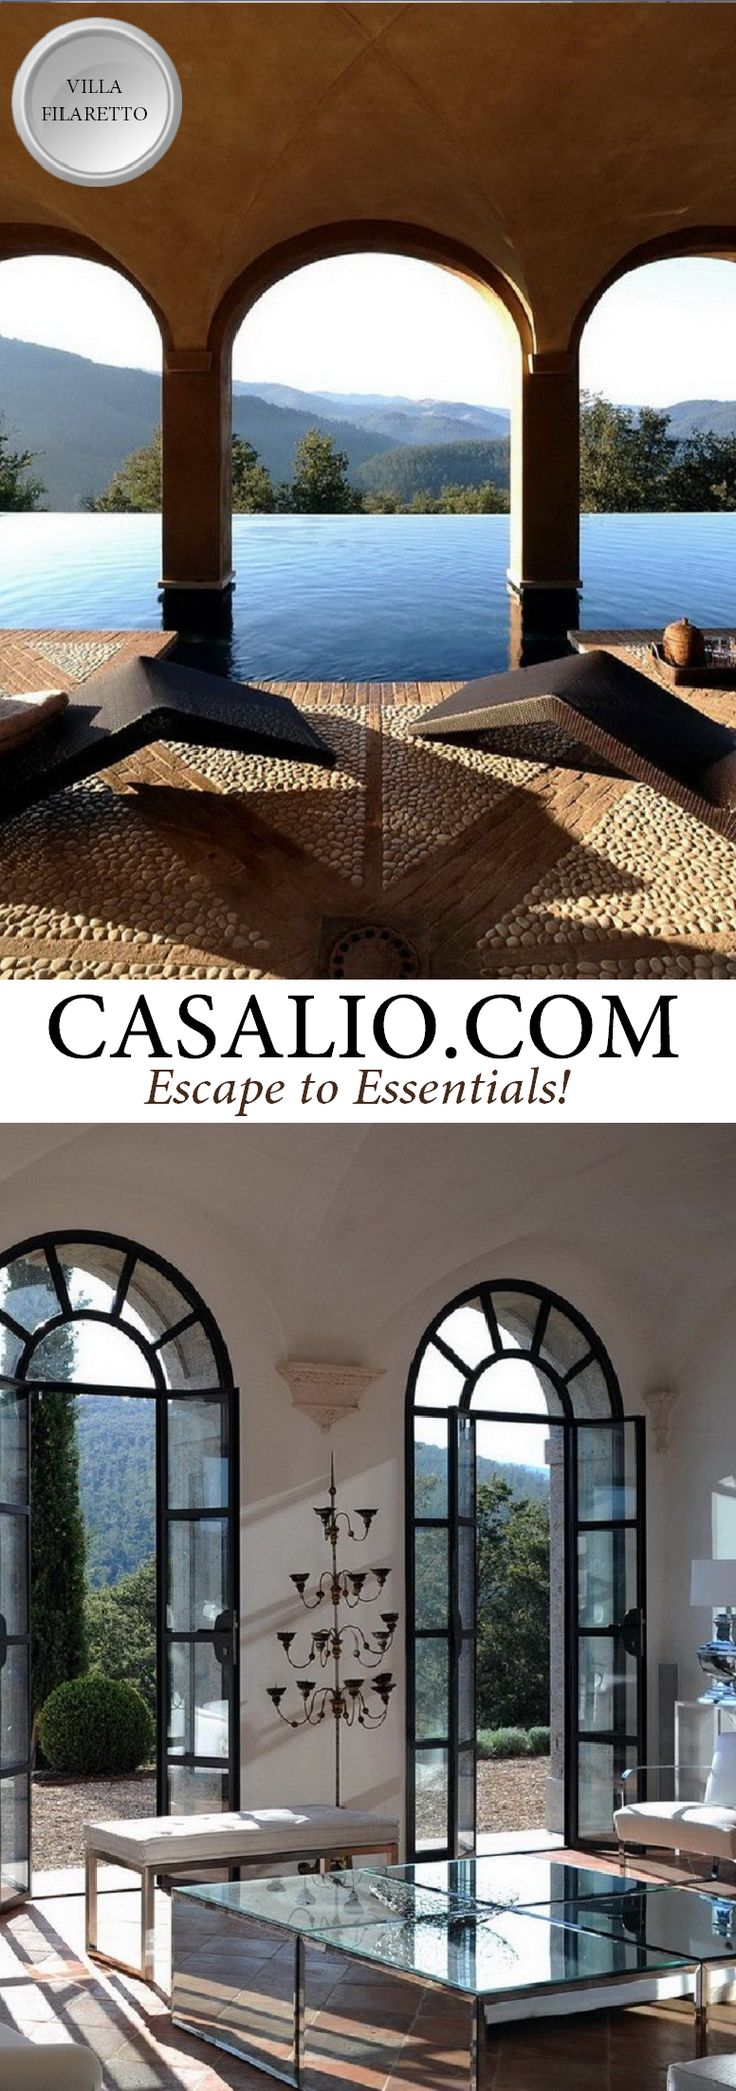 Umbria Holiday Villas -  www.casalio.com    Villa Filaretto    Italy - Umbria    Perugia, 5 bedrooms, swimming pool, air-conditioner. Villa Filaretto is a large formal rendered villa located in the heart of the Estate.#Luxury #LuxuryVillas #Villas #Rental #Italy #Umbria #Perugia #Travel #LuxuryLife #LuxuryLifeStyle (Pinned by #Casalio - www.casalio.com)